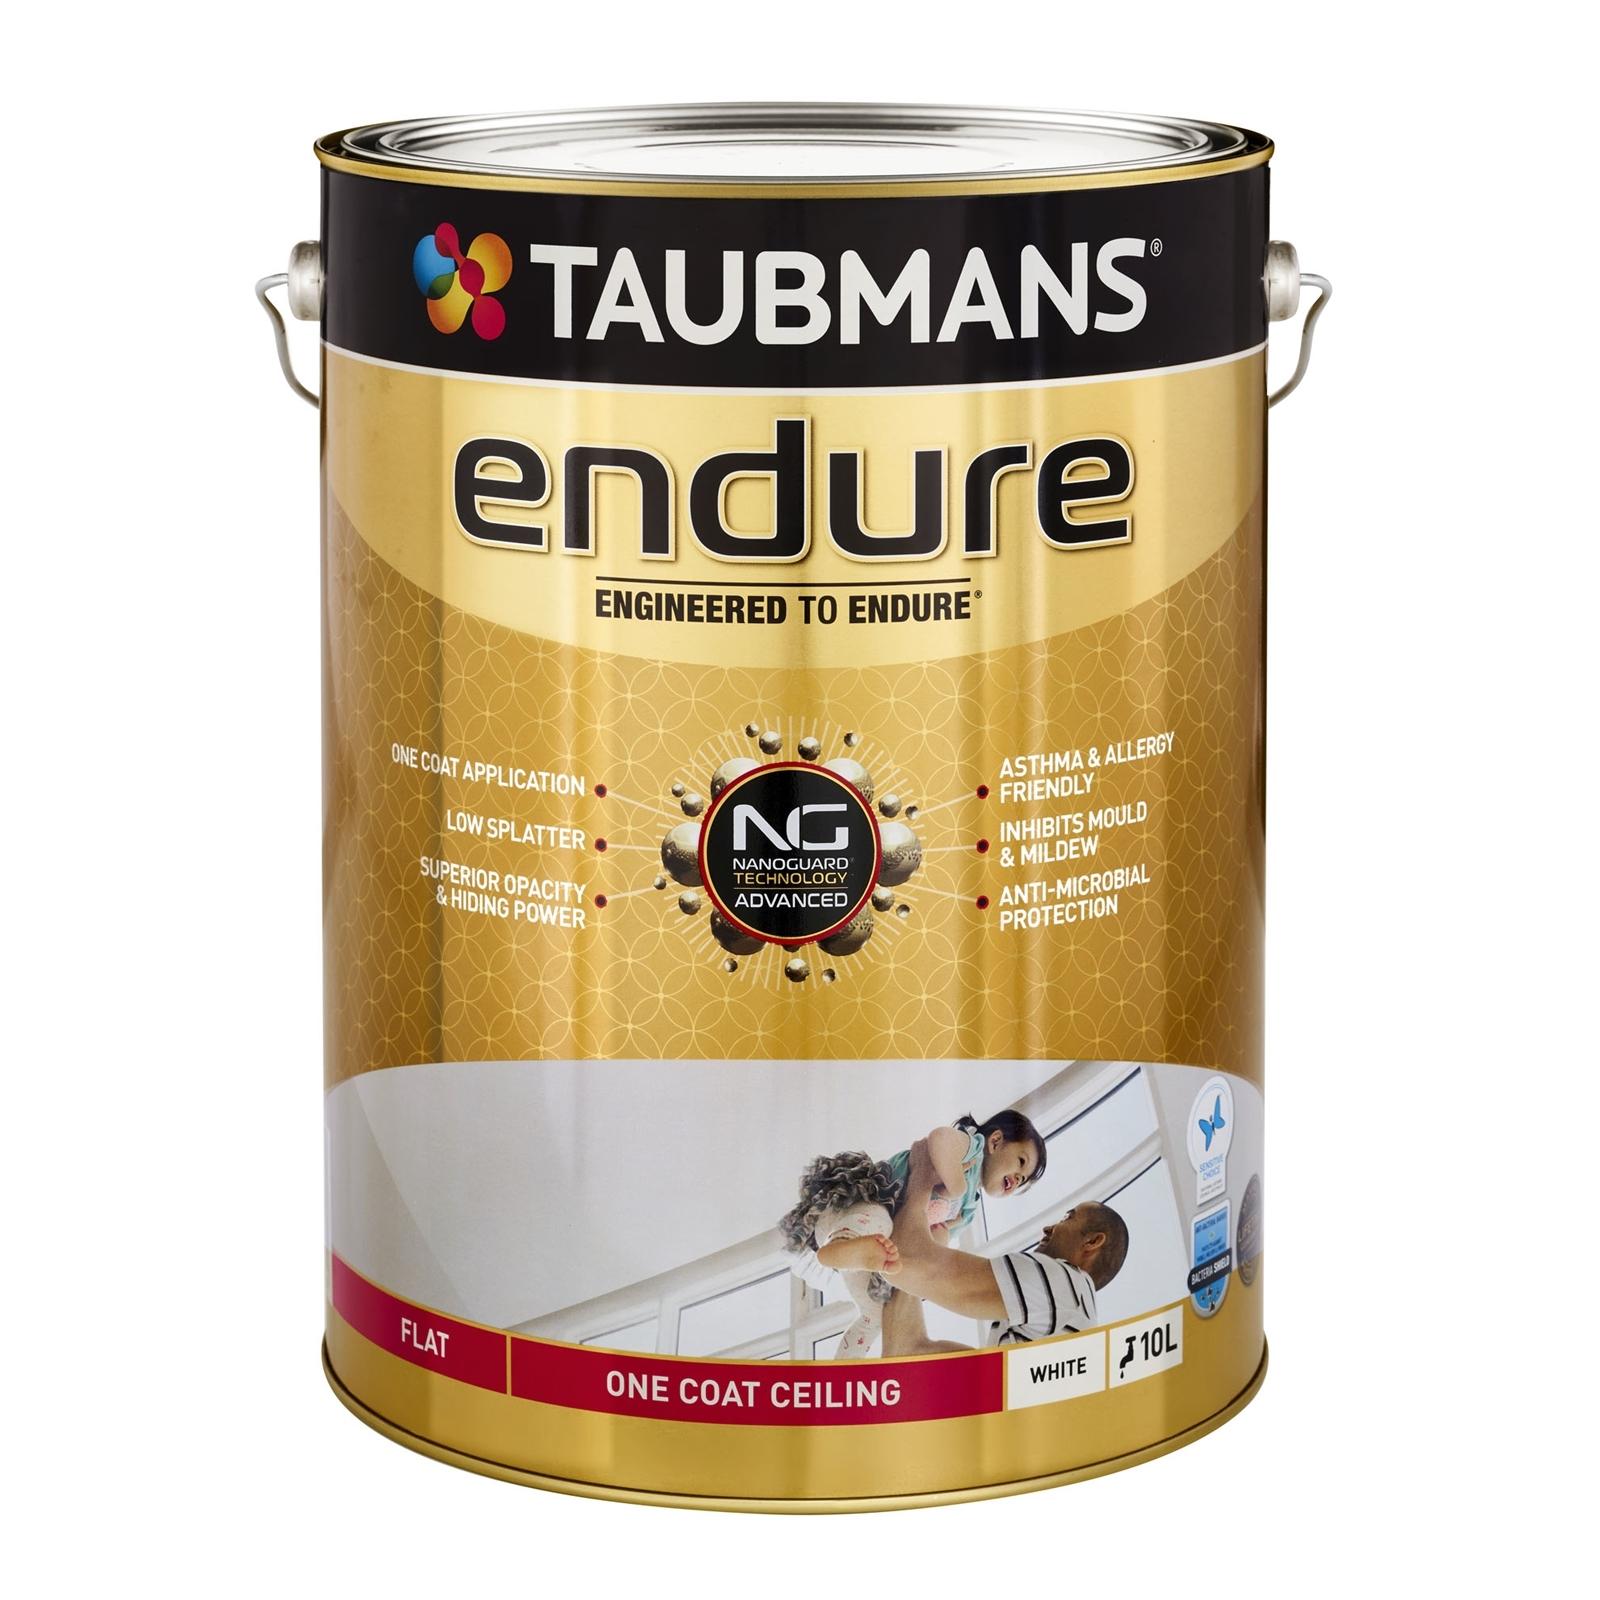 Taubmans 10L White Endure Flat One Coat Ceiling Paint